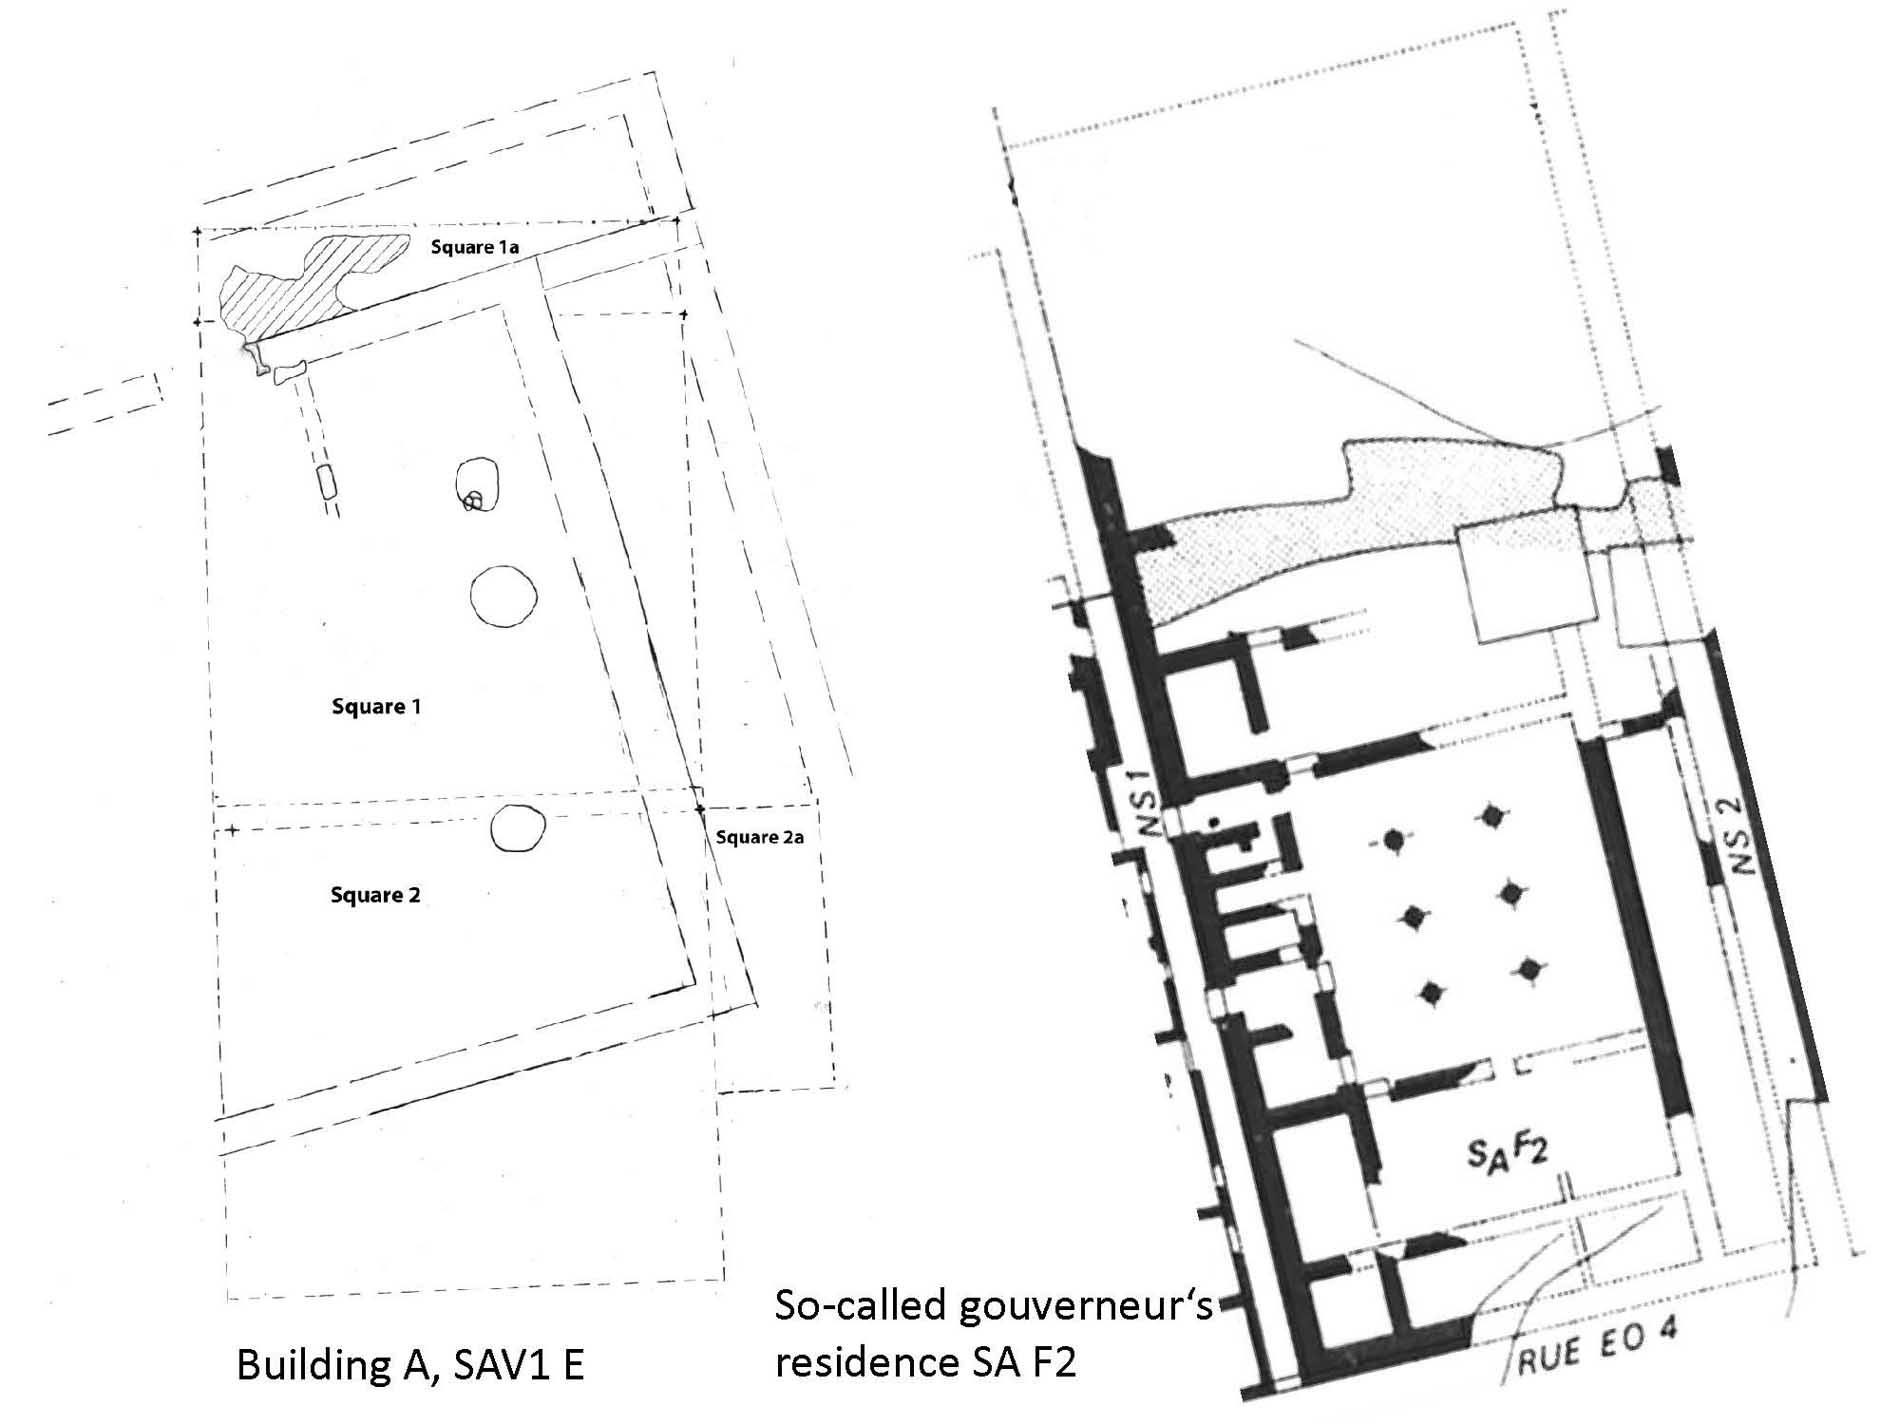 brick architecture acrossborders Concept Diagrams Architecture building a reconstruction small